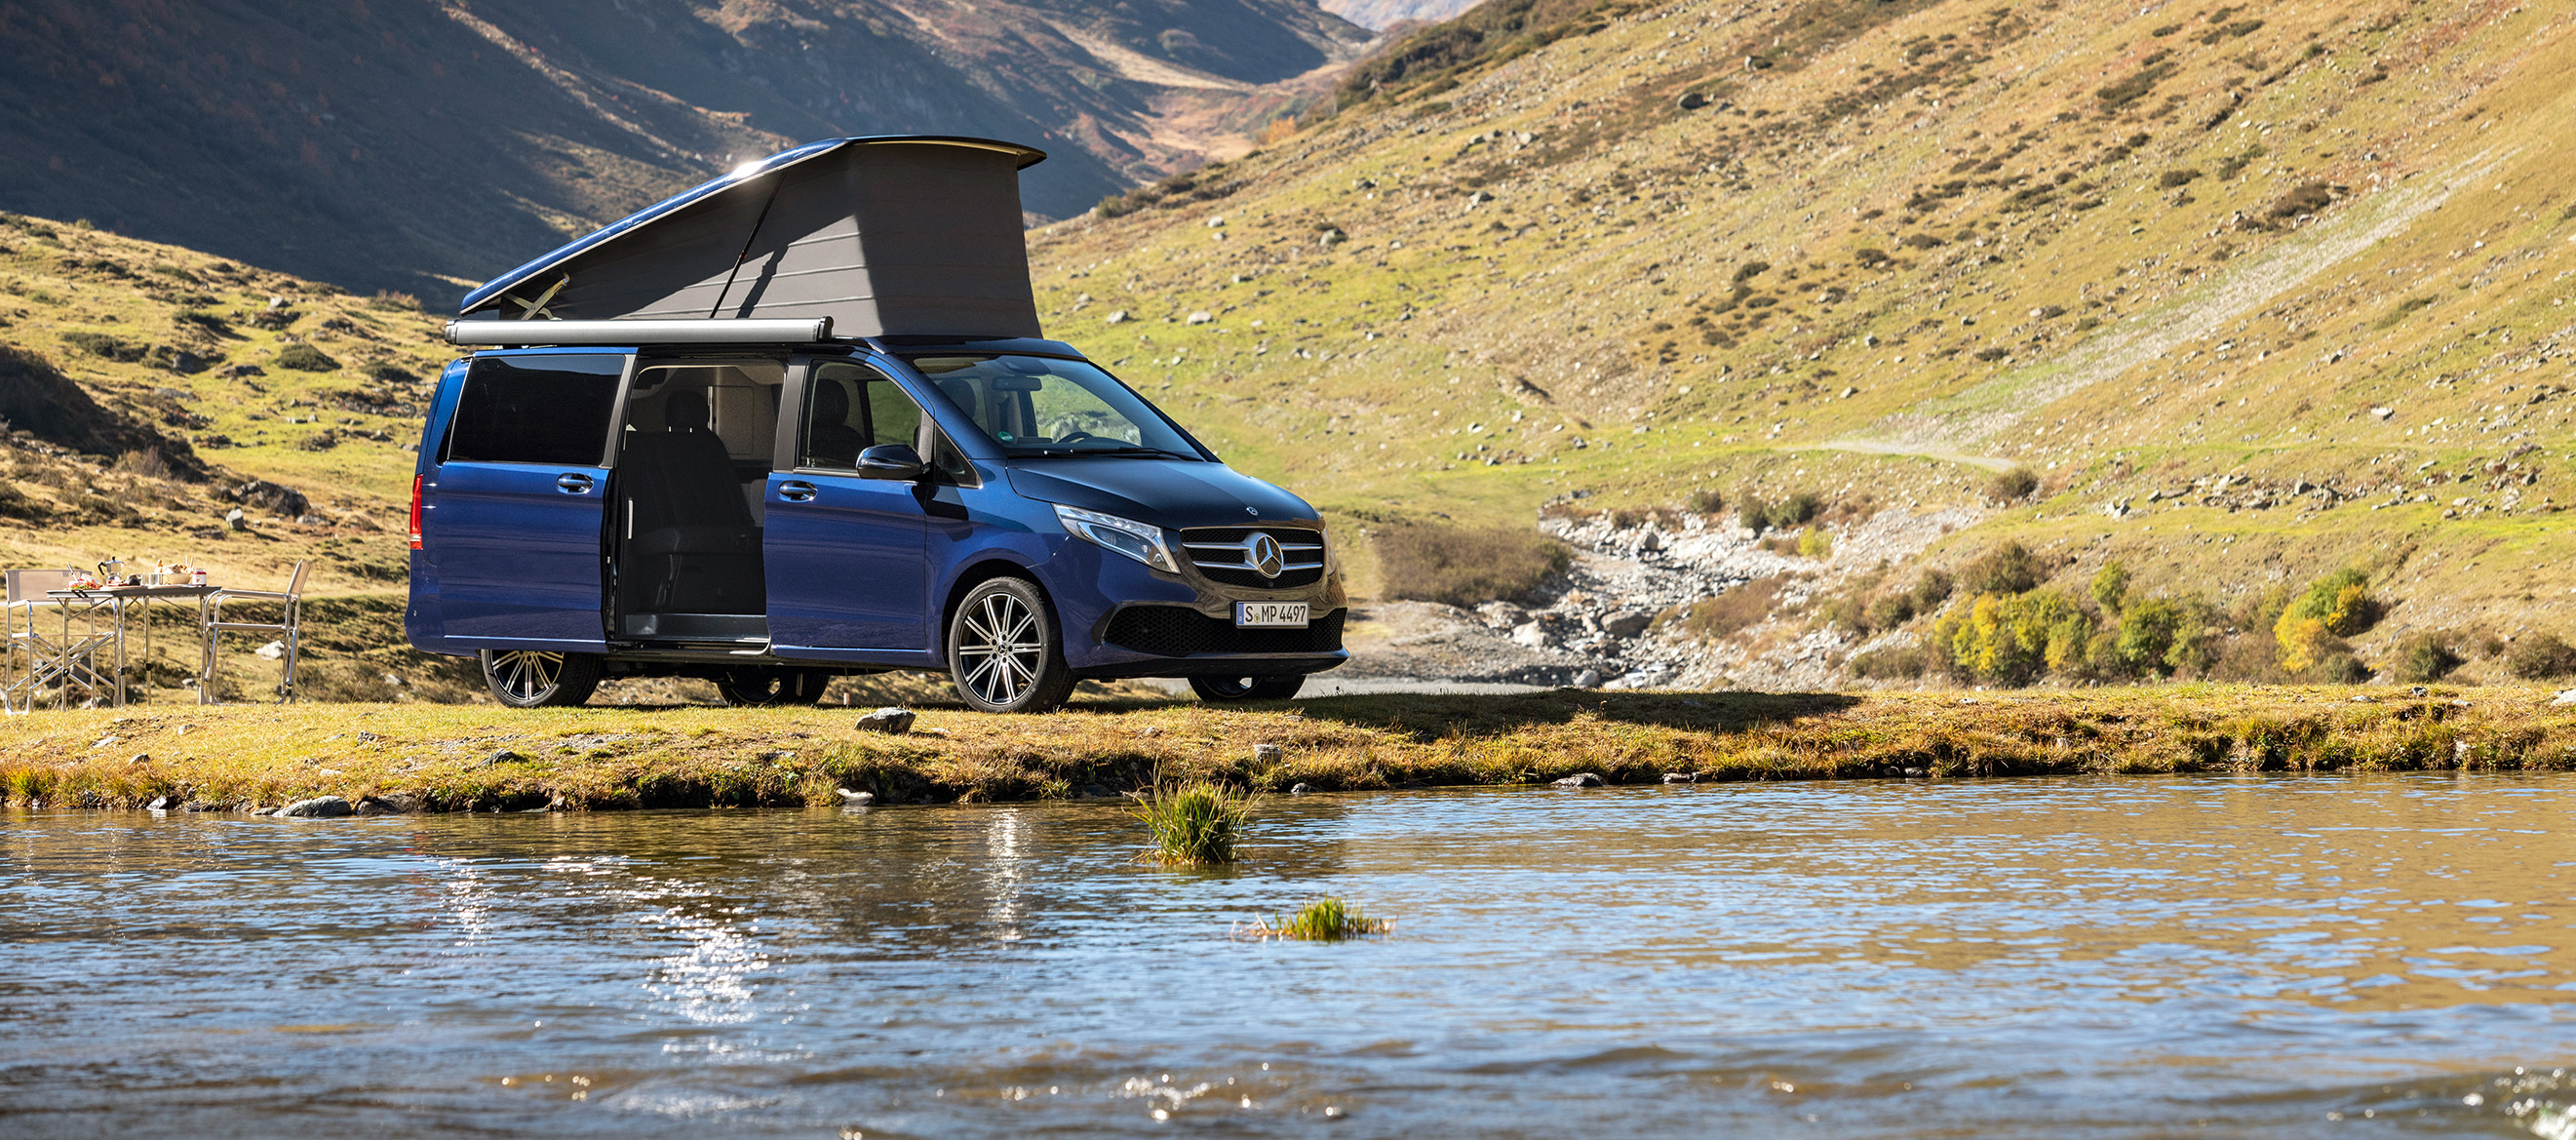 Mercedes-Benz Clase V, renovación del Best-Seller del segmento